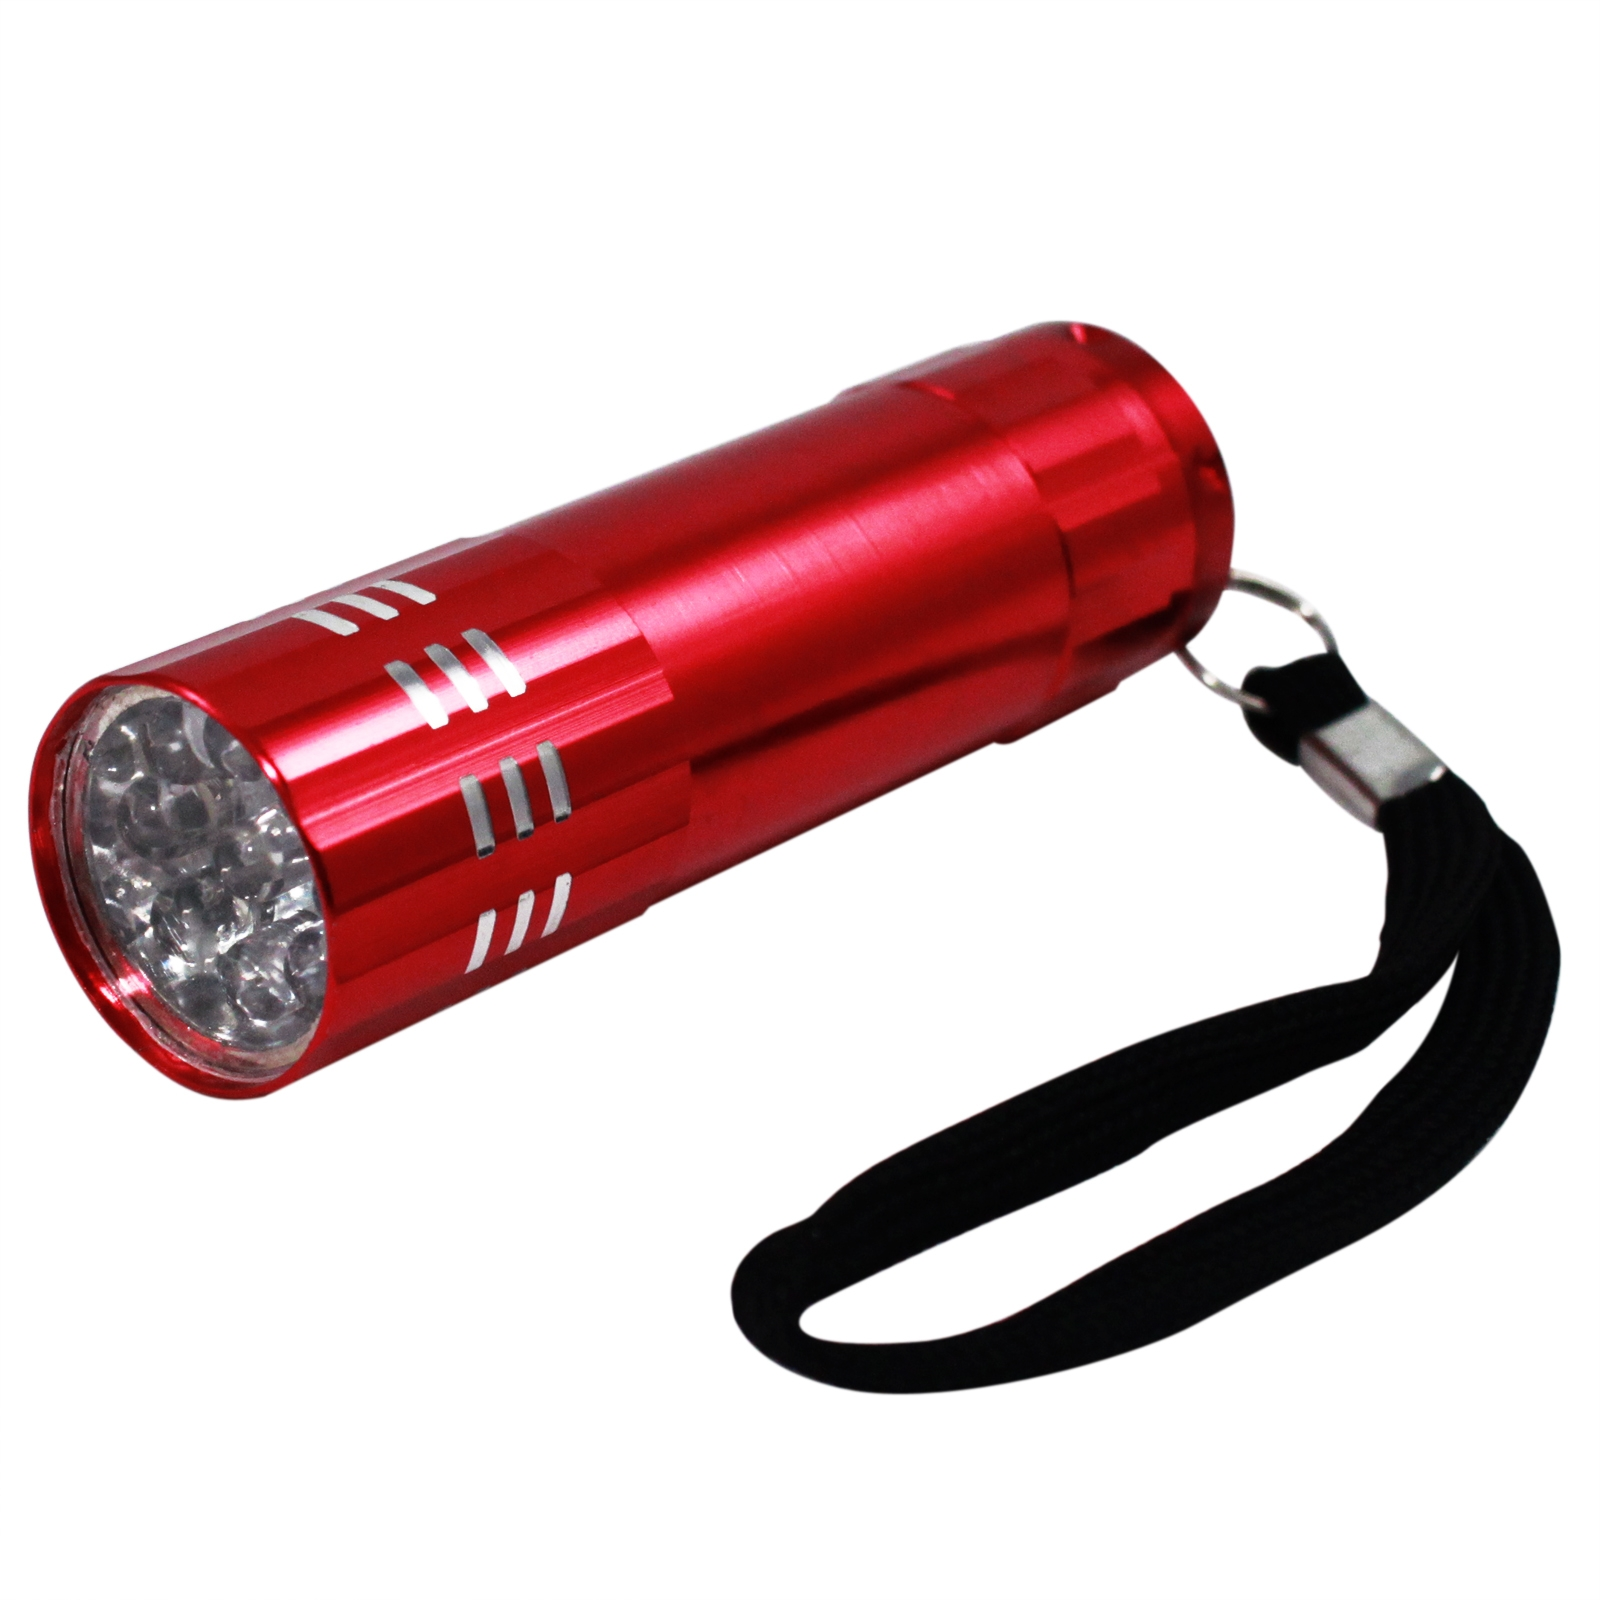 9 LED Super Bright Portable Mini Flashlight with Lanyard - Multiple Colors